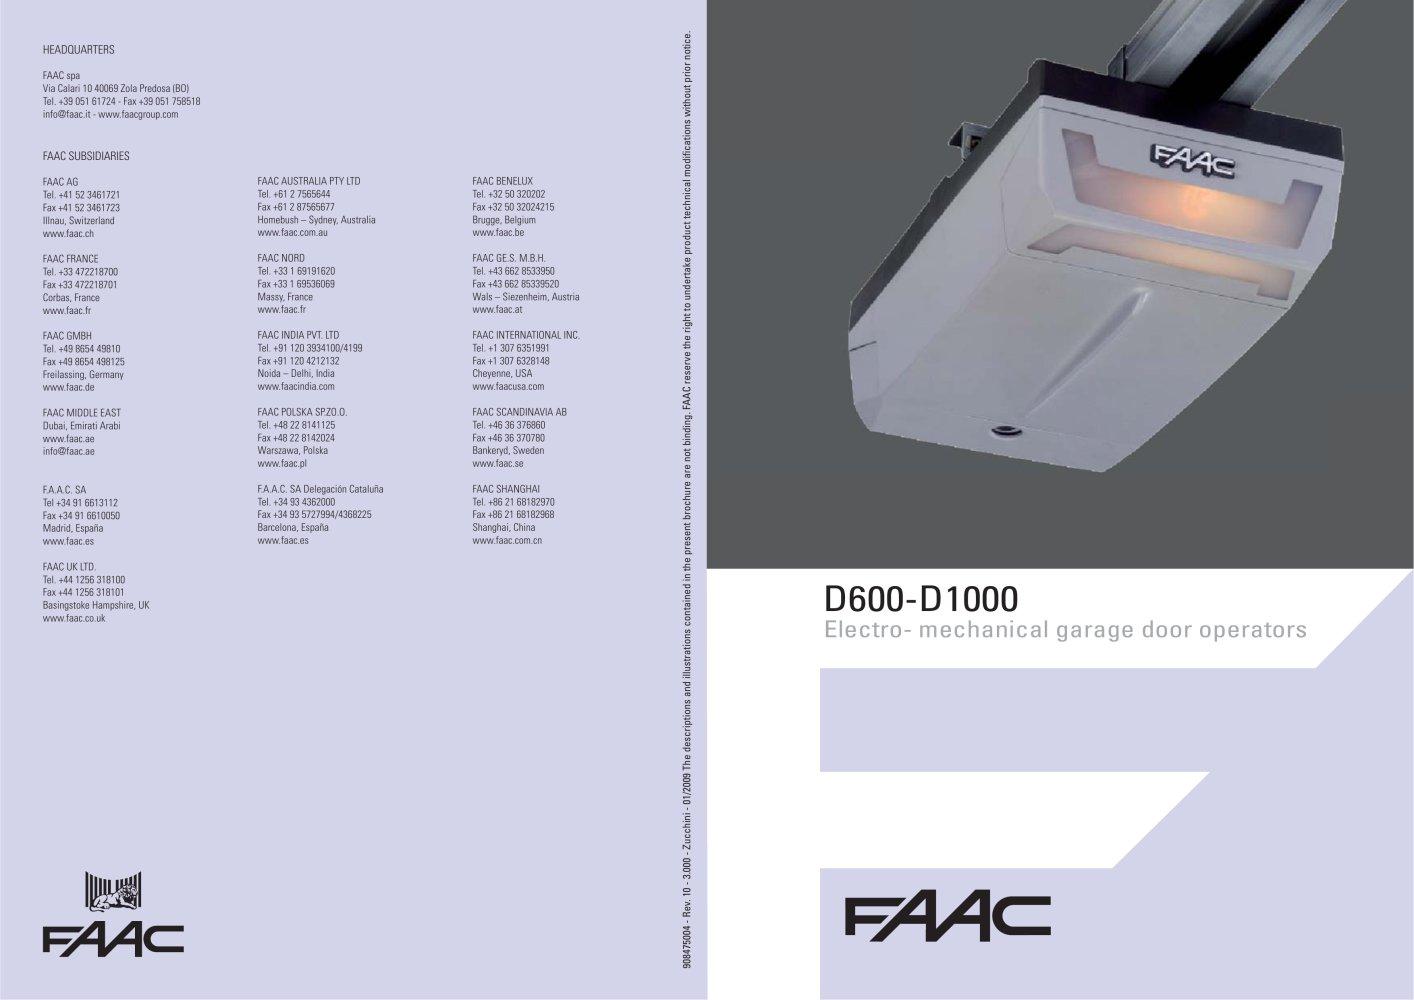 D1000 Garage Door Operator Faac Pdf Catalogues Documentation